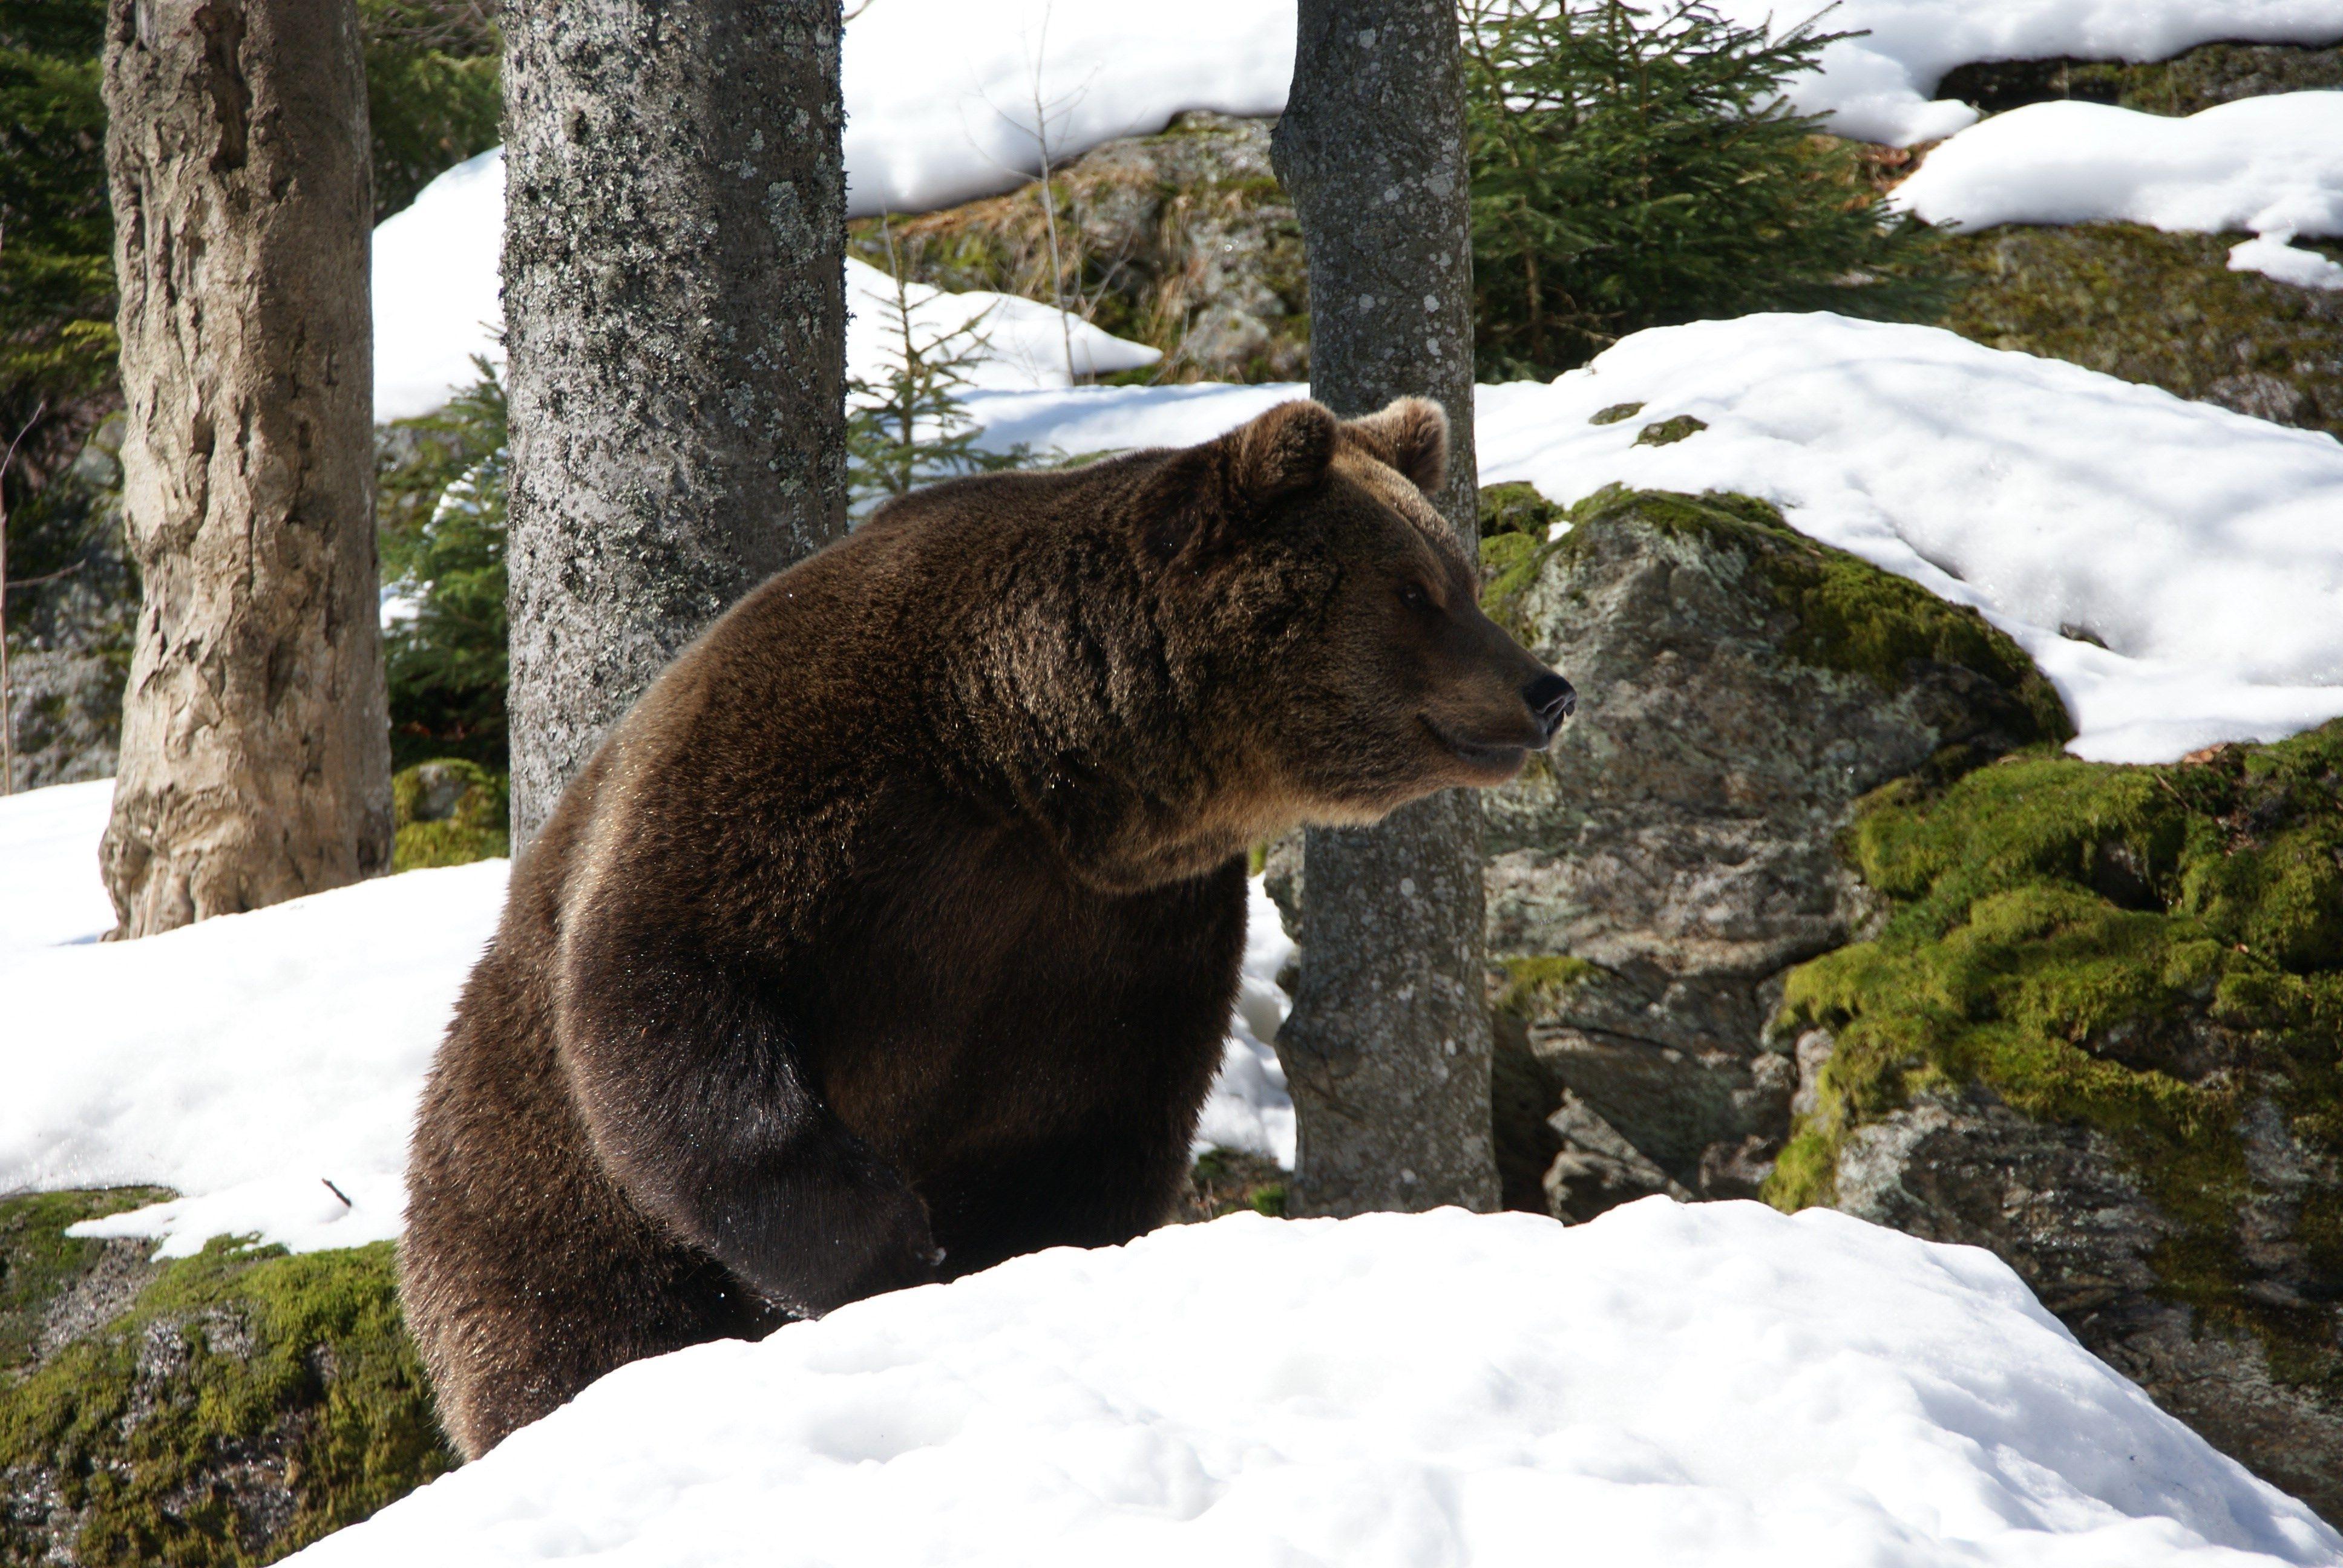 4k wallpaper bear (3872x2592) (с изображениями) Обои с